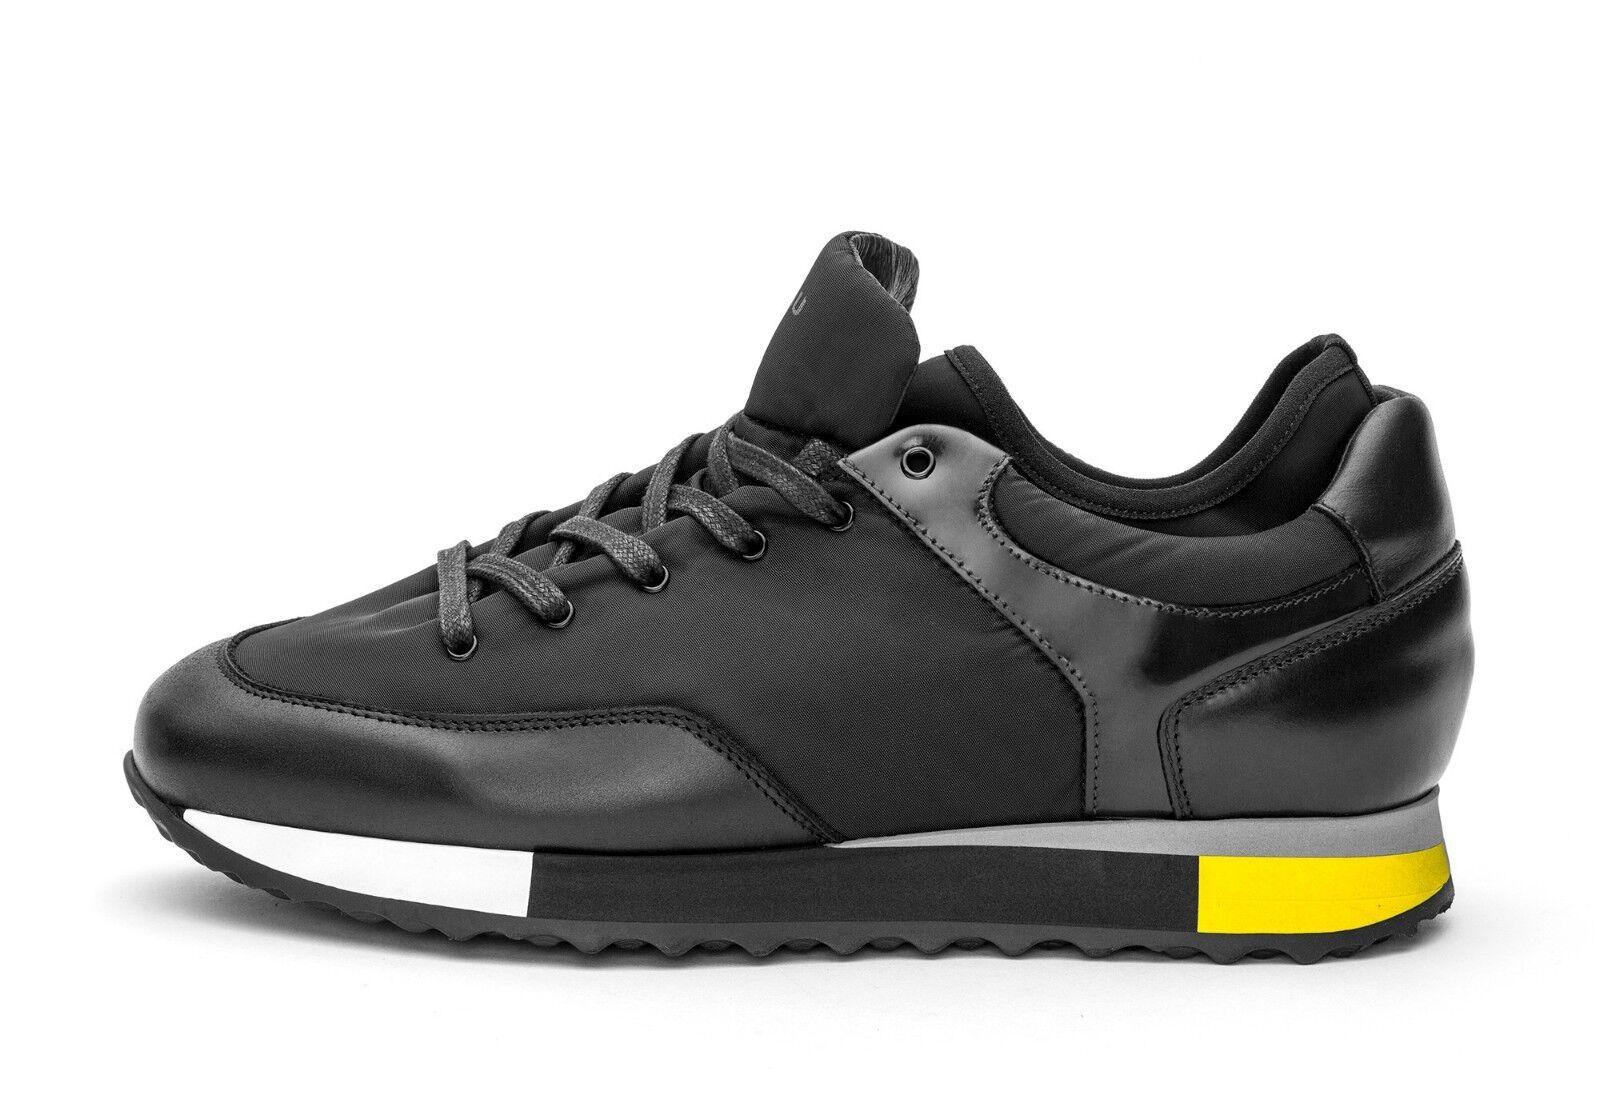 FRAU FRAU FRAU 23M2 sneaker uomo tessuto pelle nero giallo suola gomma made in Italy 32ee9b